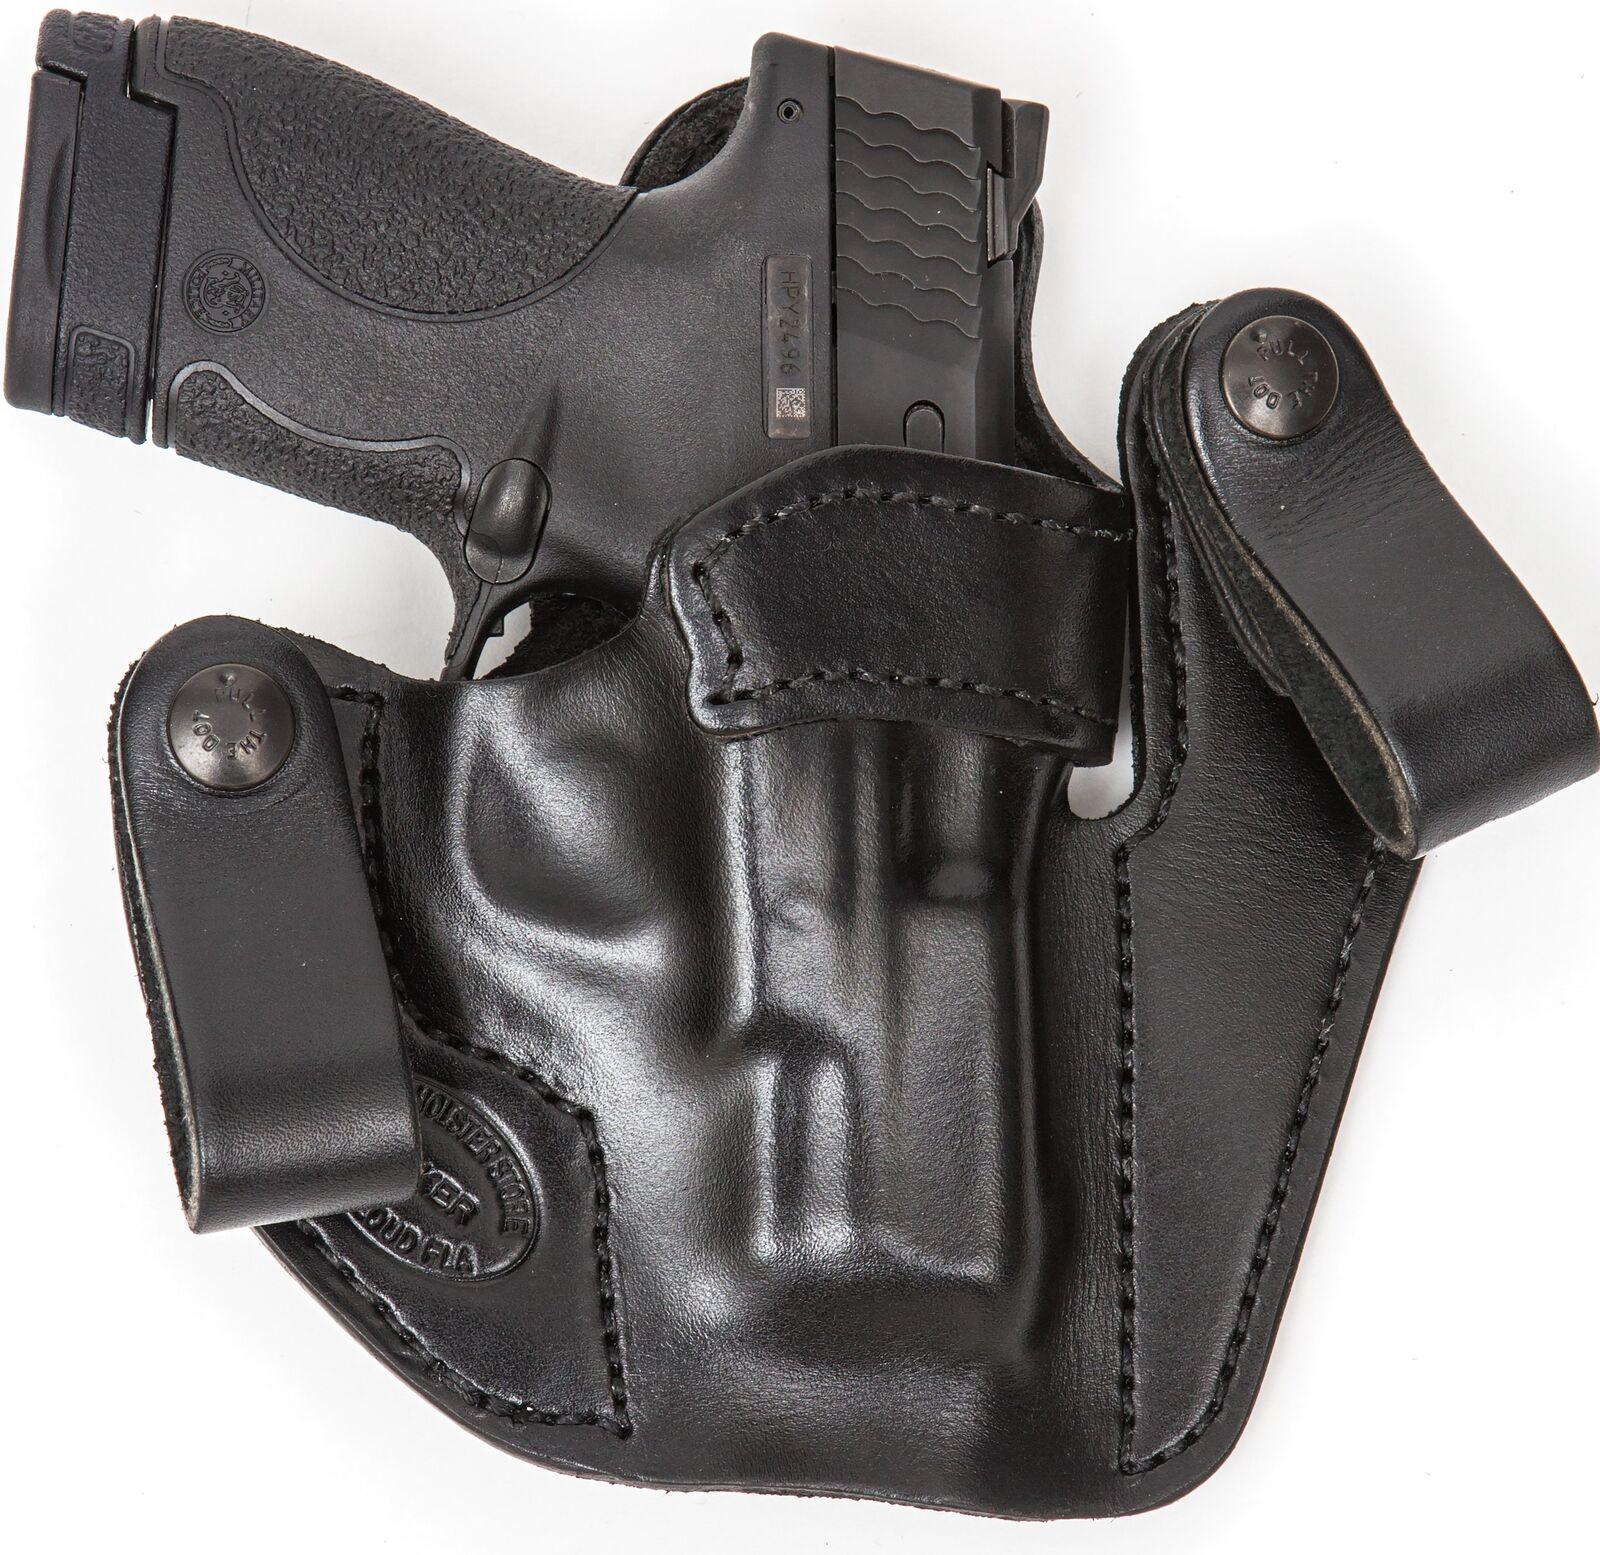 Xtreme llevar RH LH IWB Cuero Funda Pistola Para Ruger SR22 con CMR201 láser